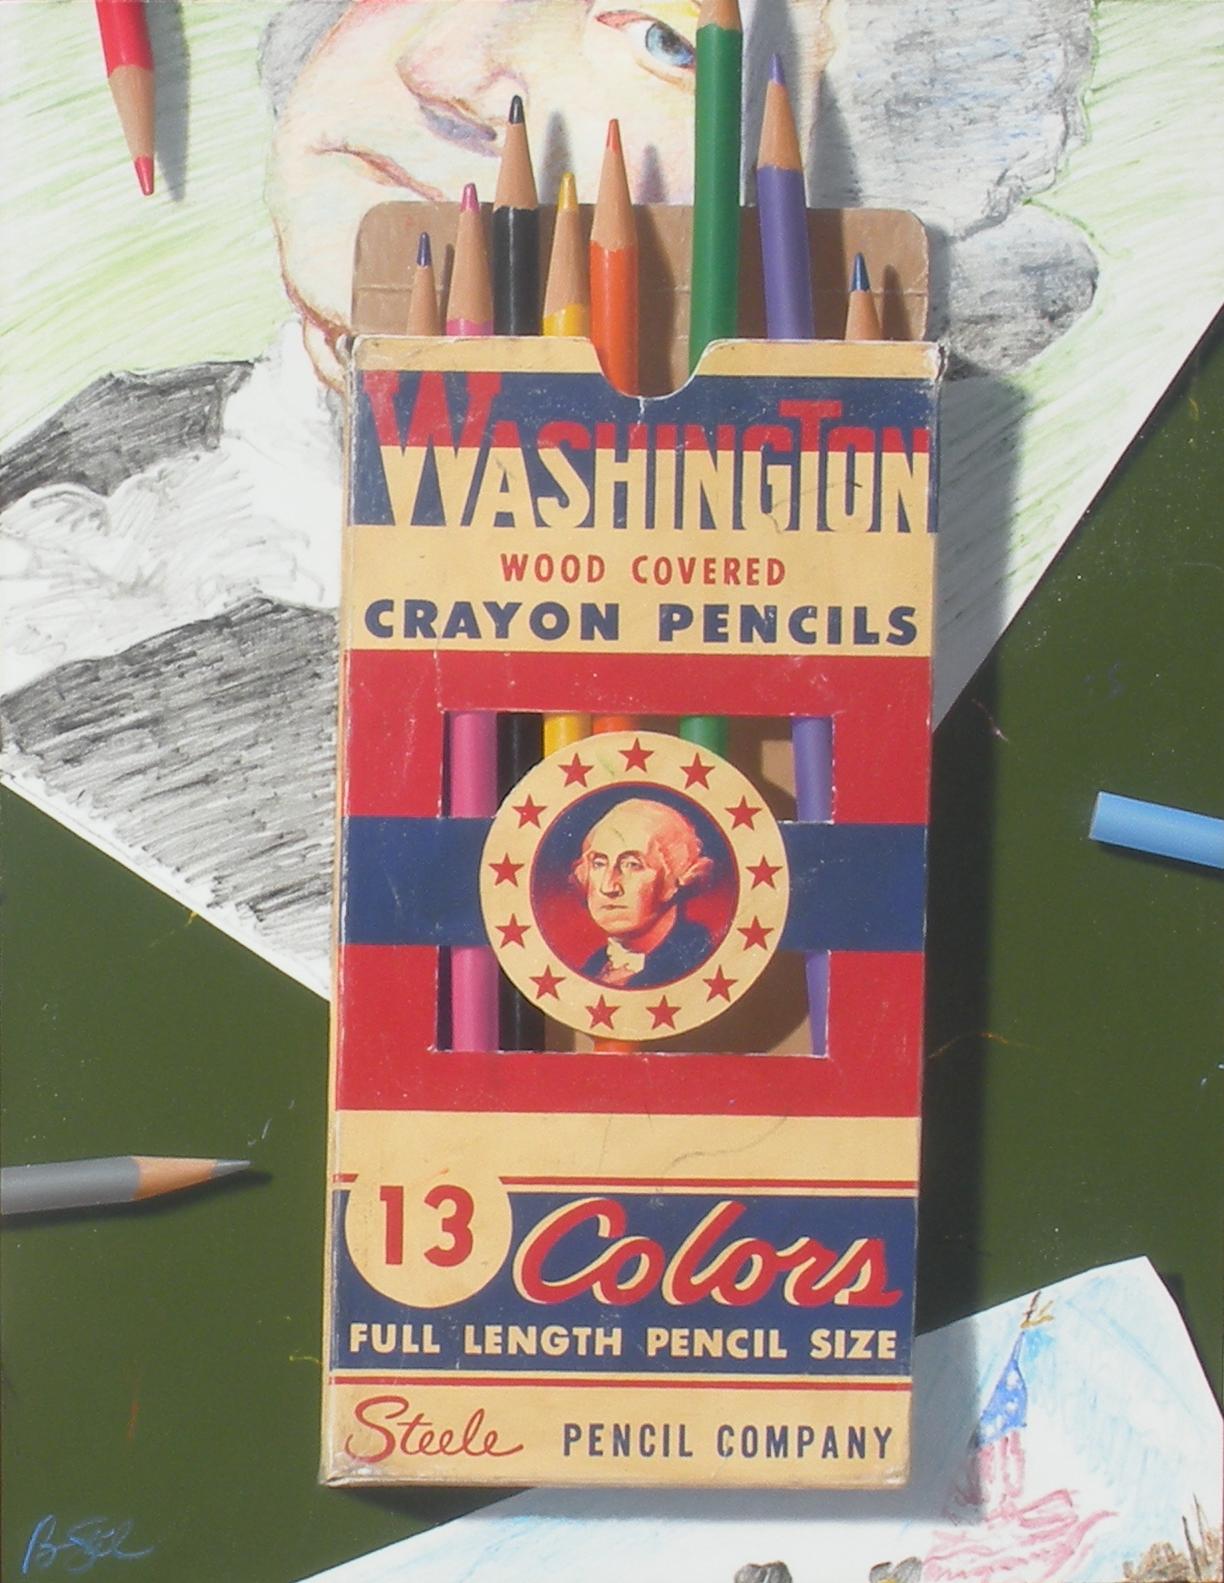 13 Colors, 2013